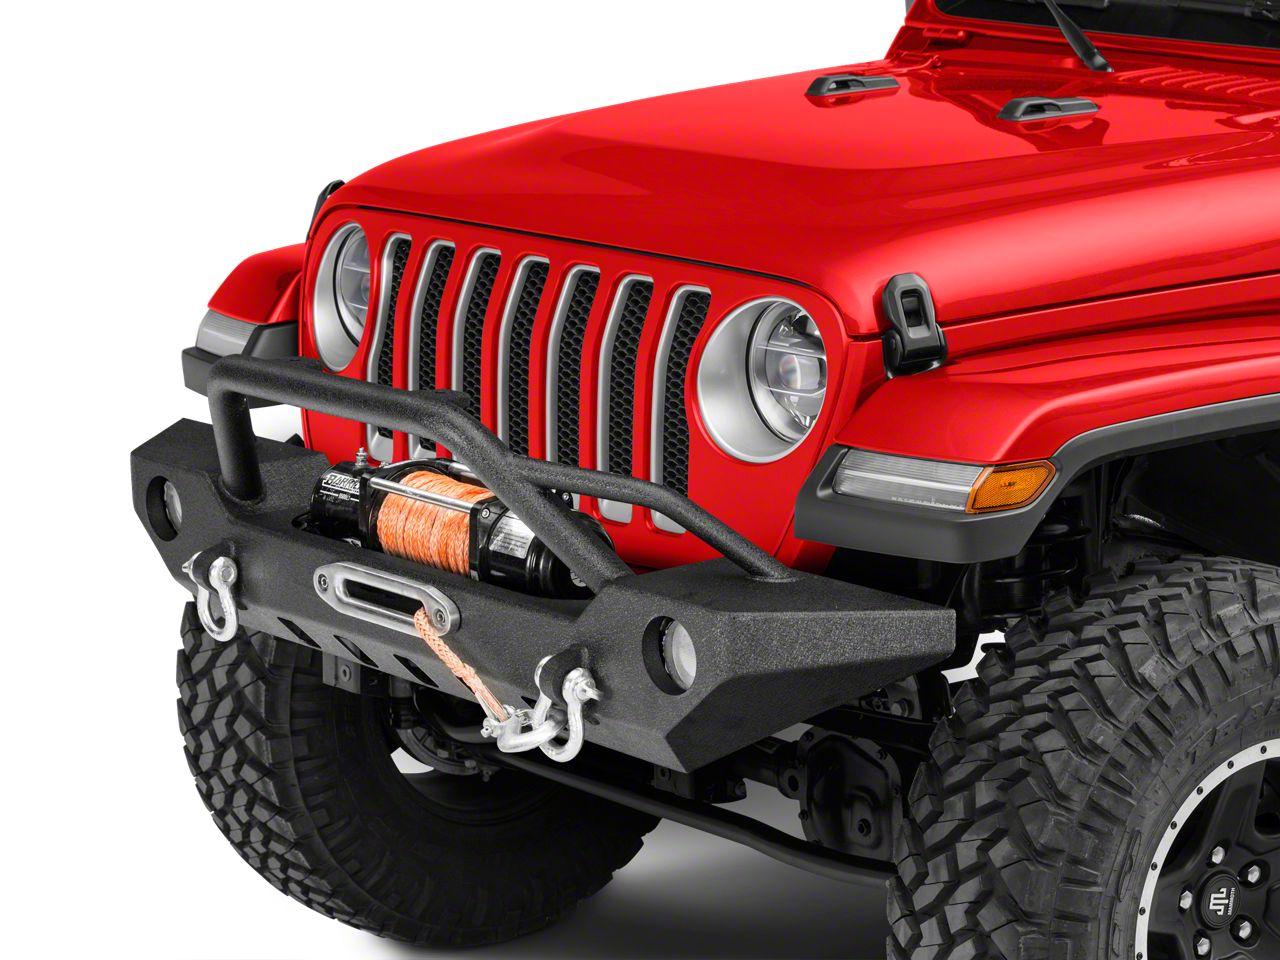 Barricade Adventure HD Front Bumper (18-19 Jeep Wrangler JL)